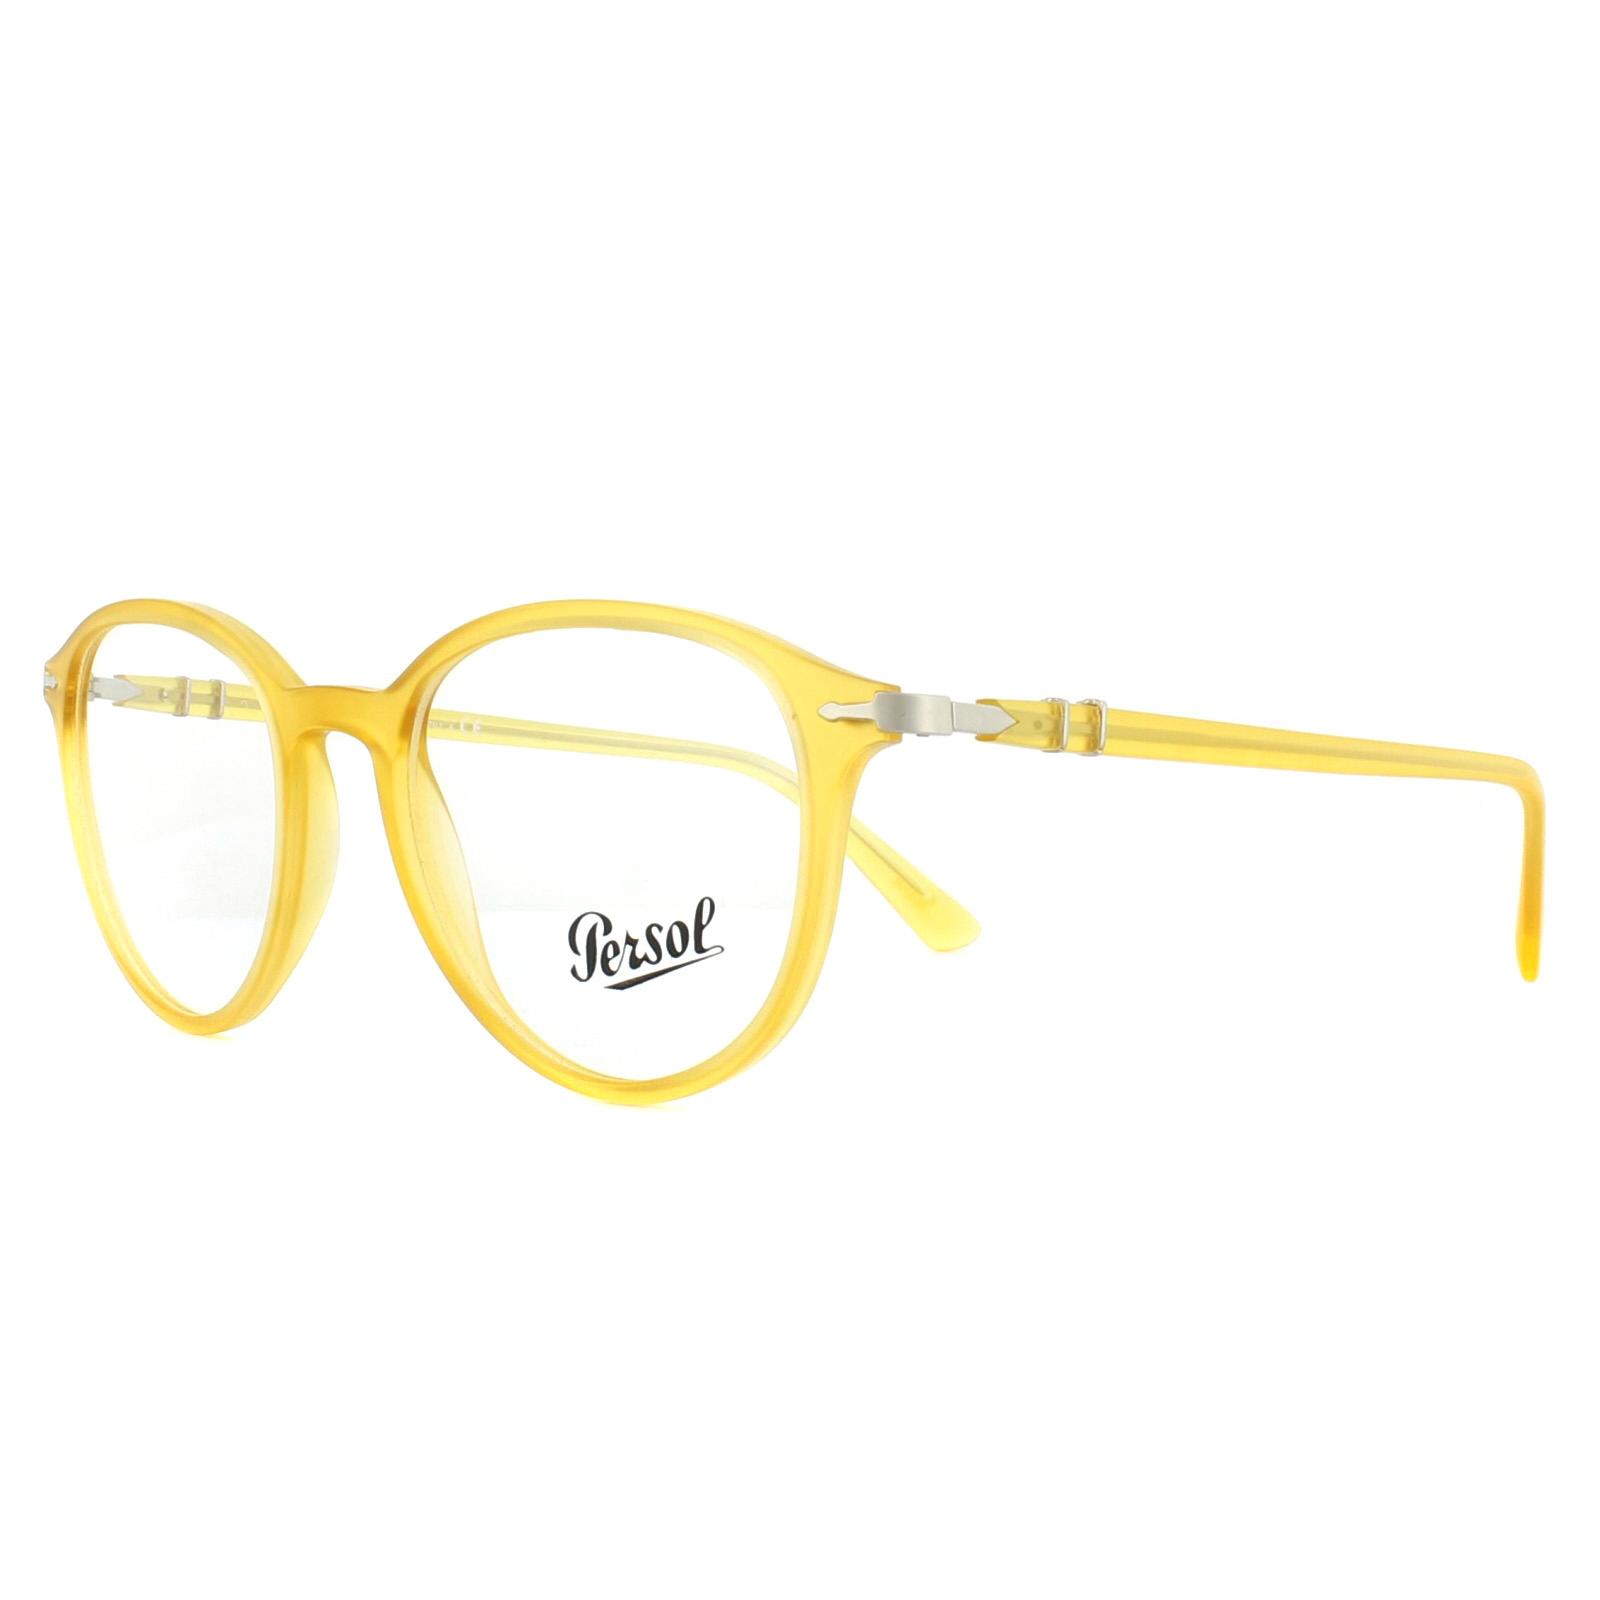 08d49ff181fc2 Sentinel Persol Glasses Frames PO3169V 1048 Matt Yellow 50mm Mens